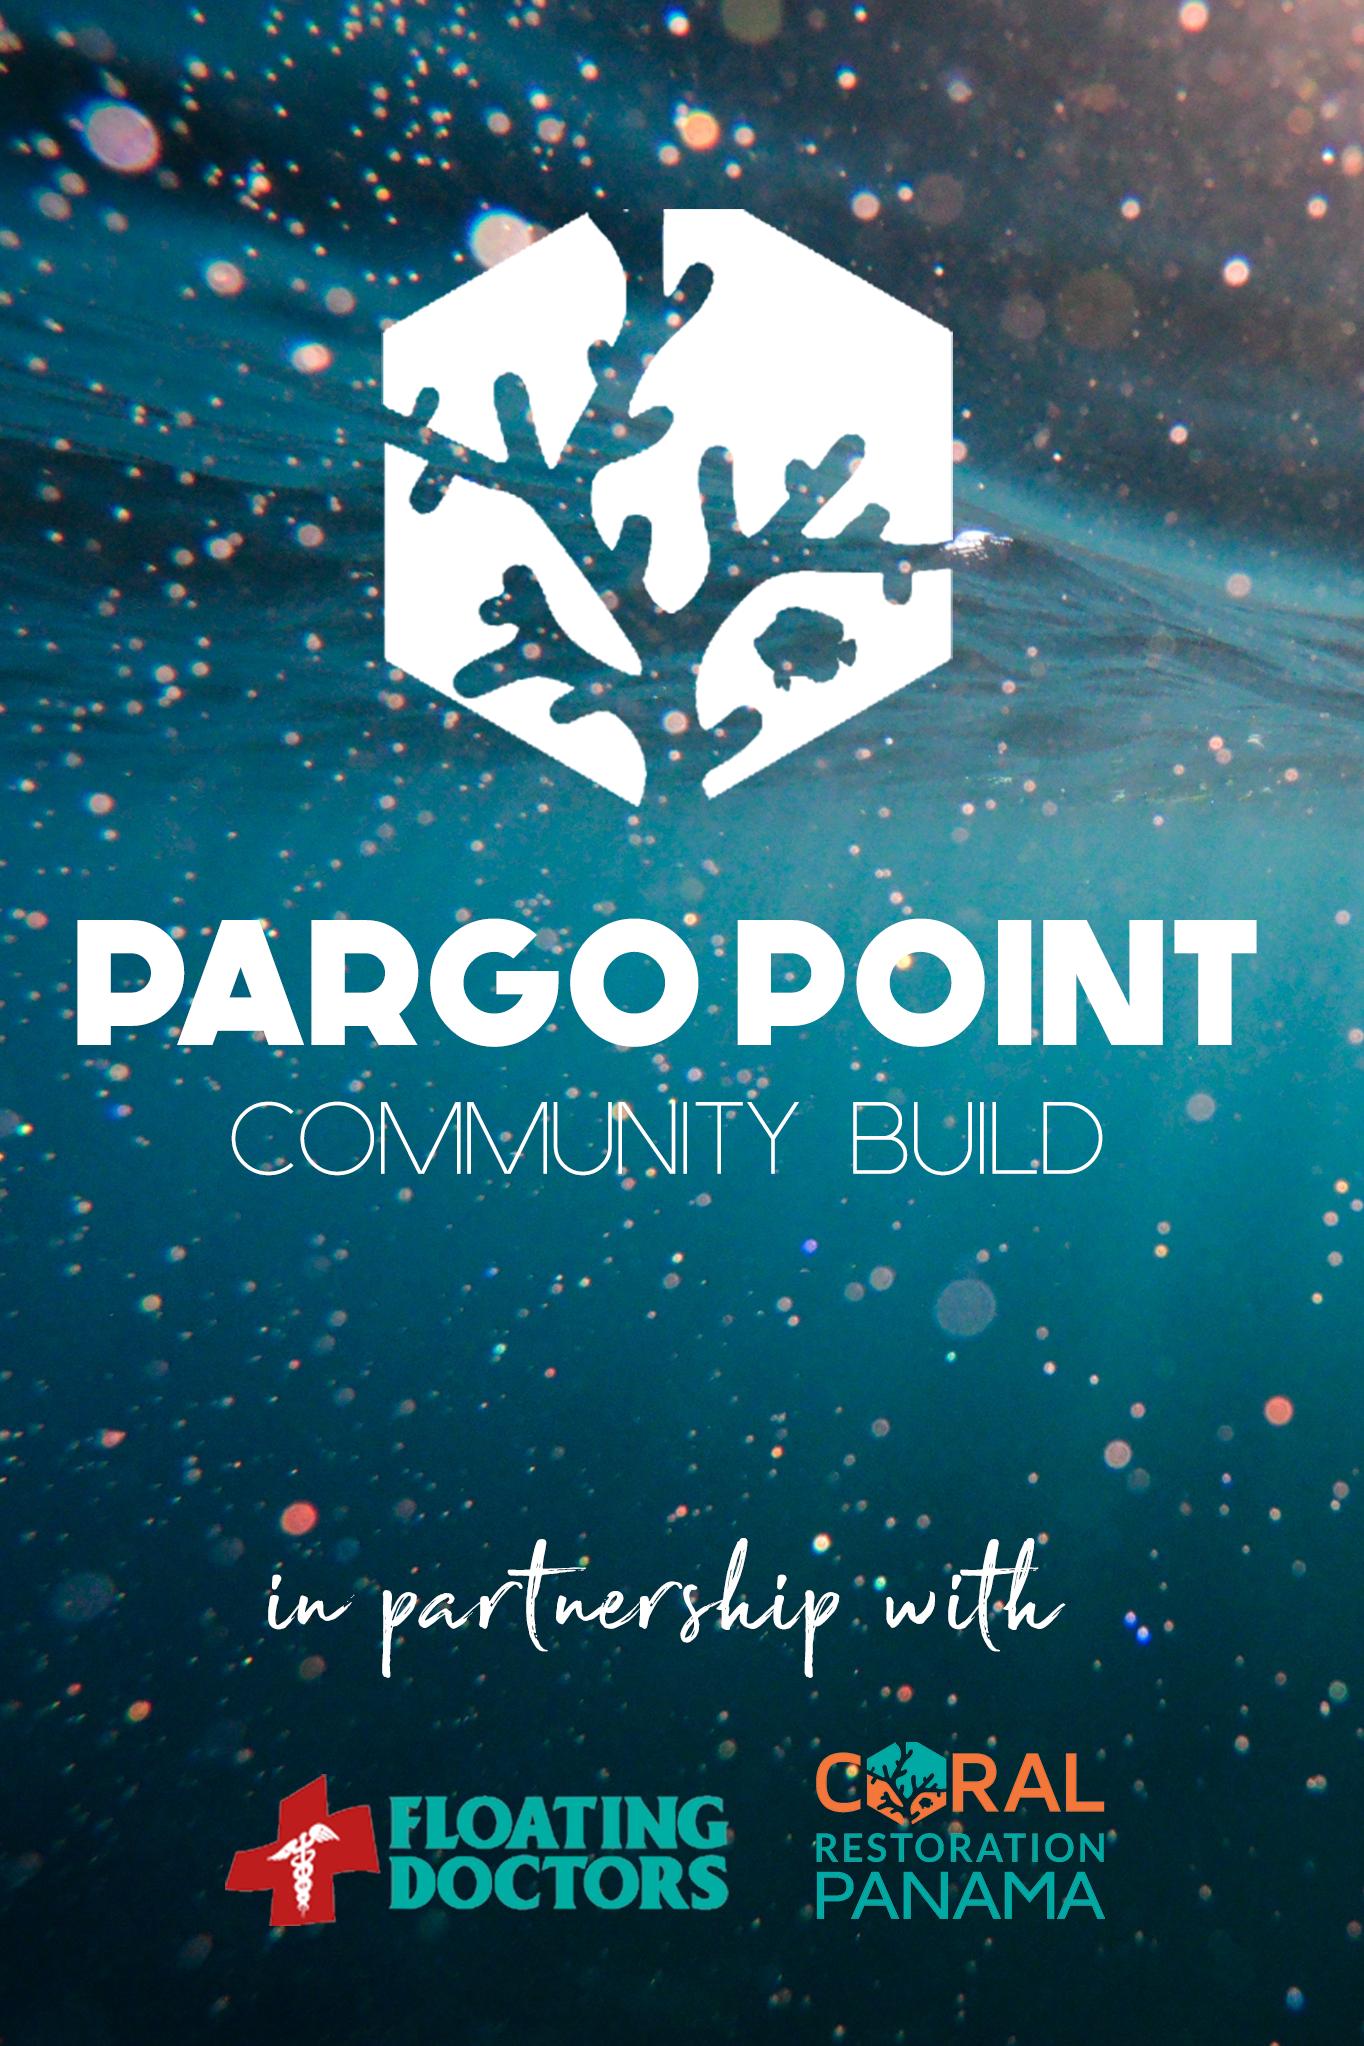 PargoPointCommunityBuild.png